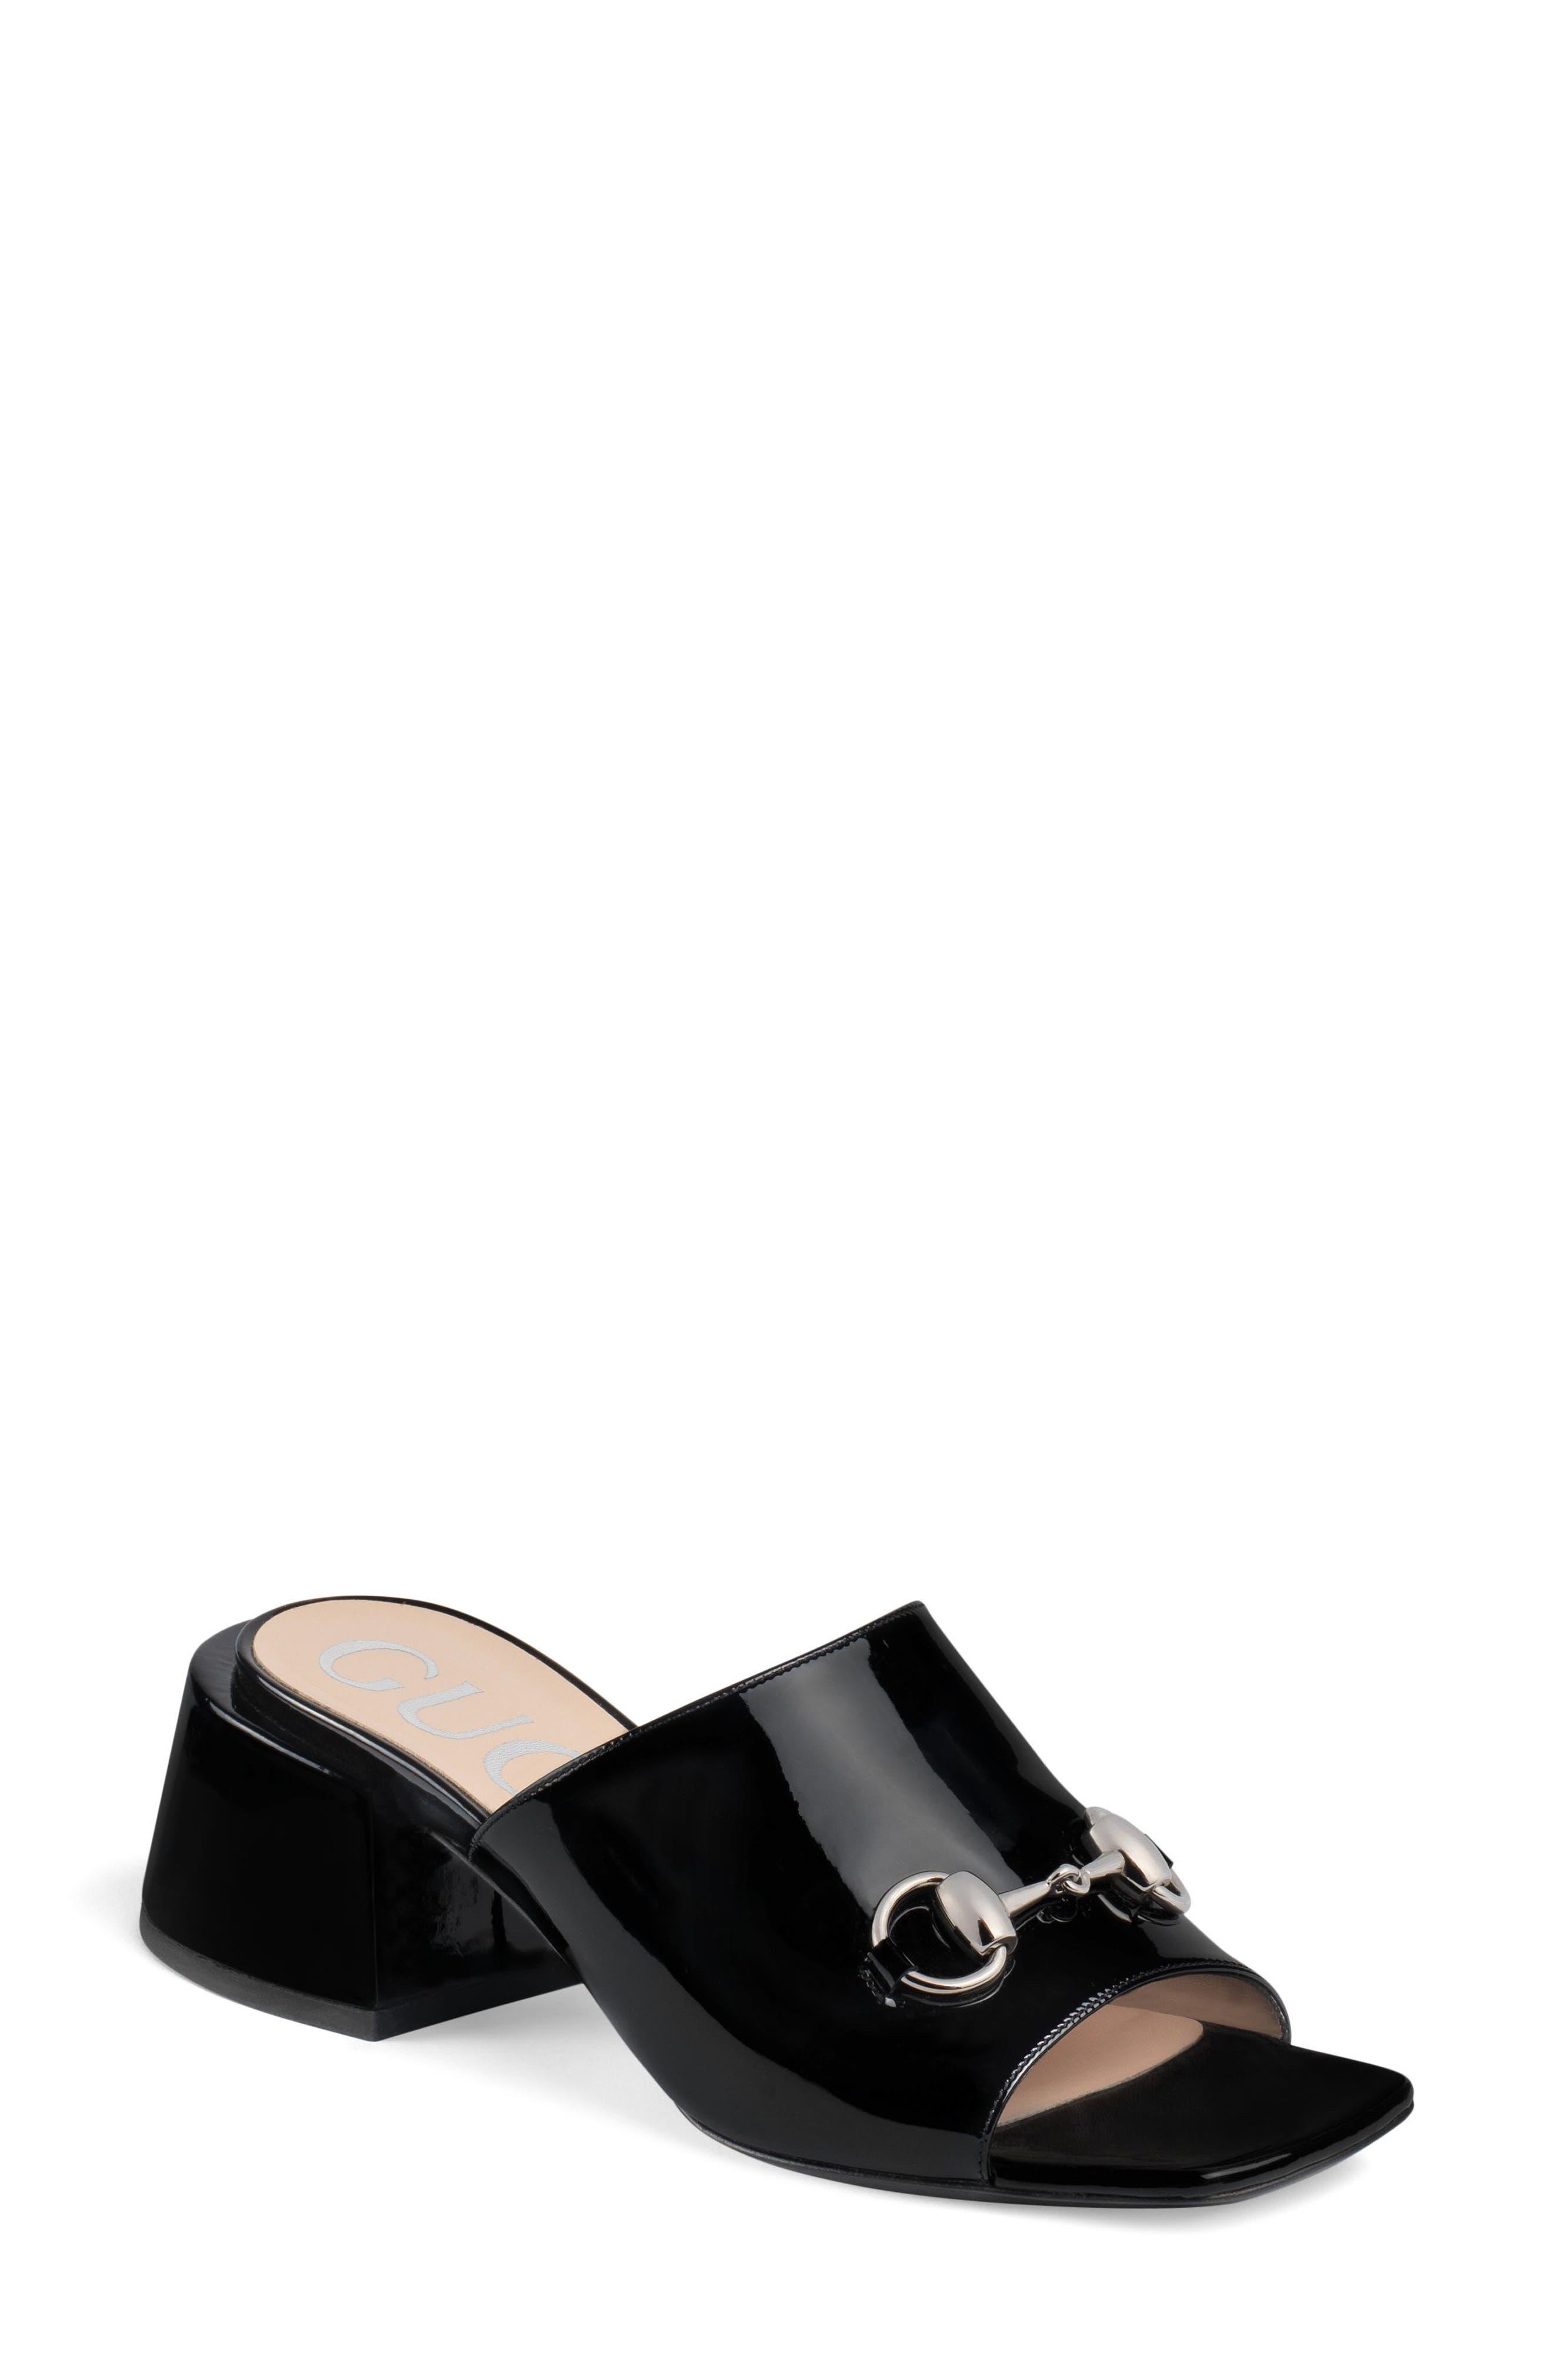 Lexi Slide Sandal,                         Main,                         color, BLACK